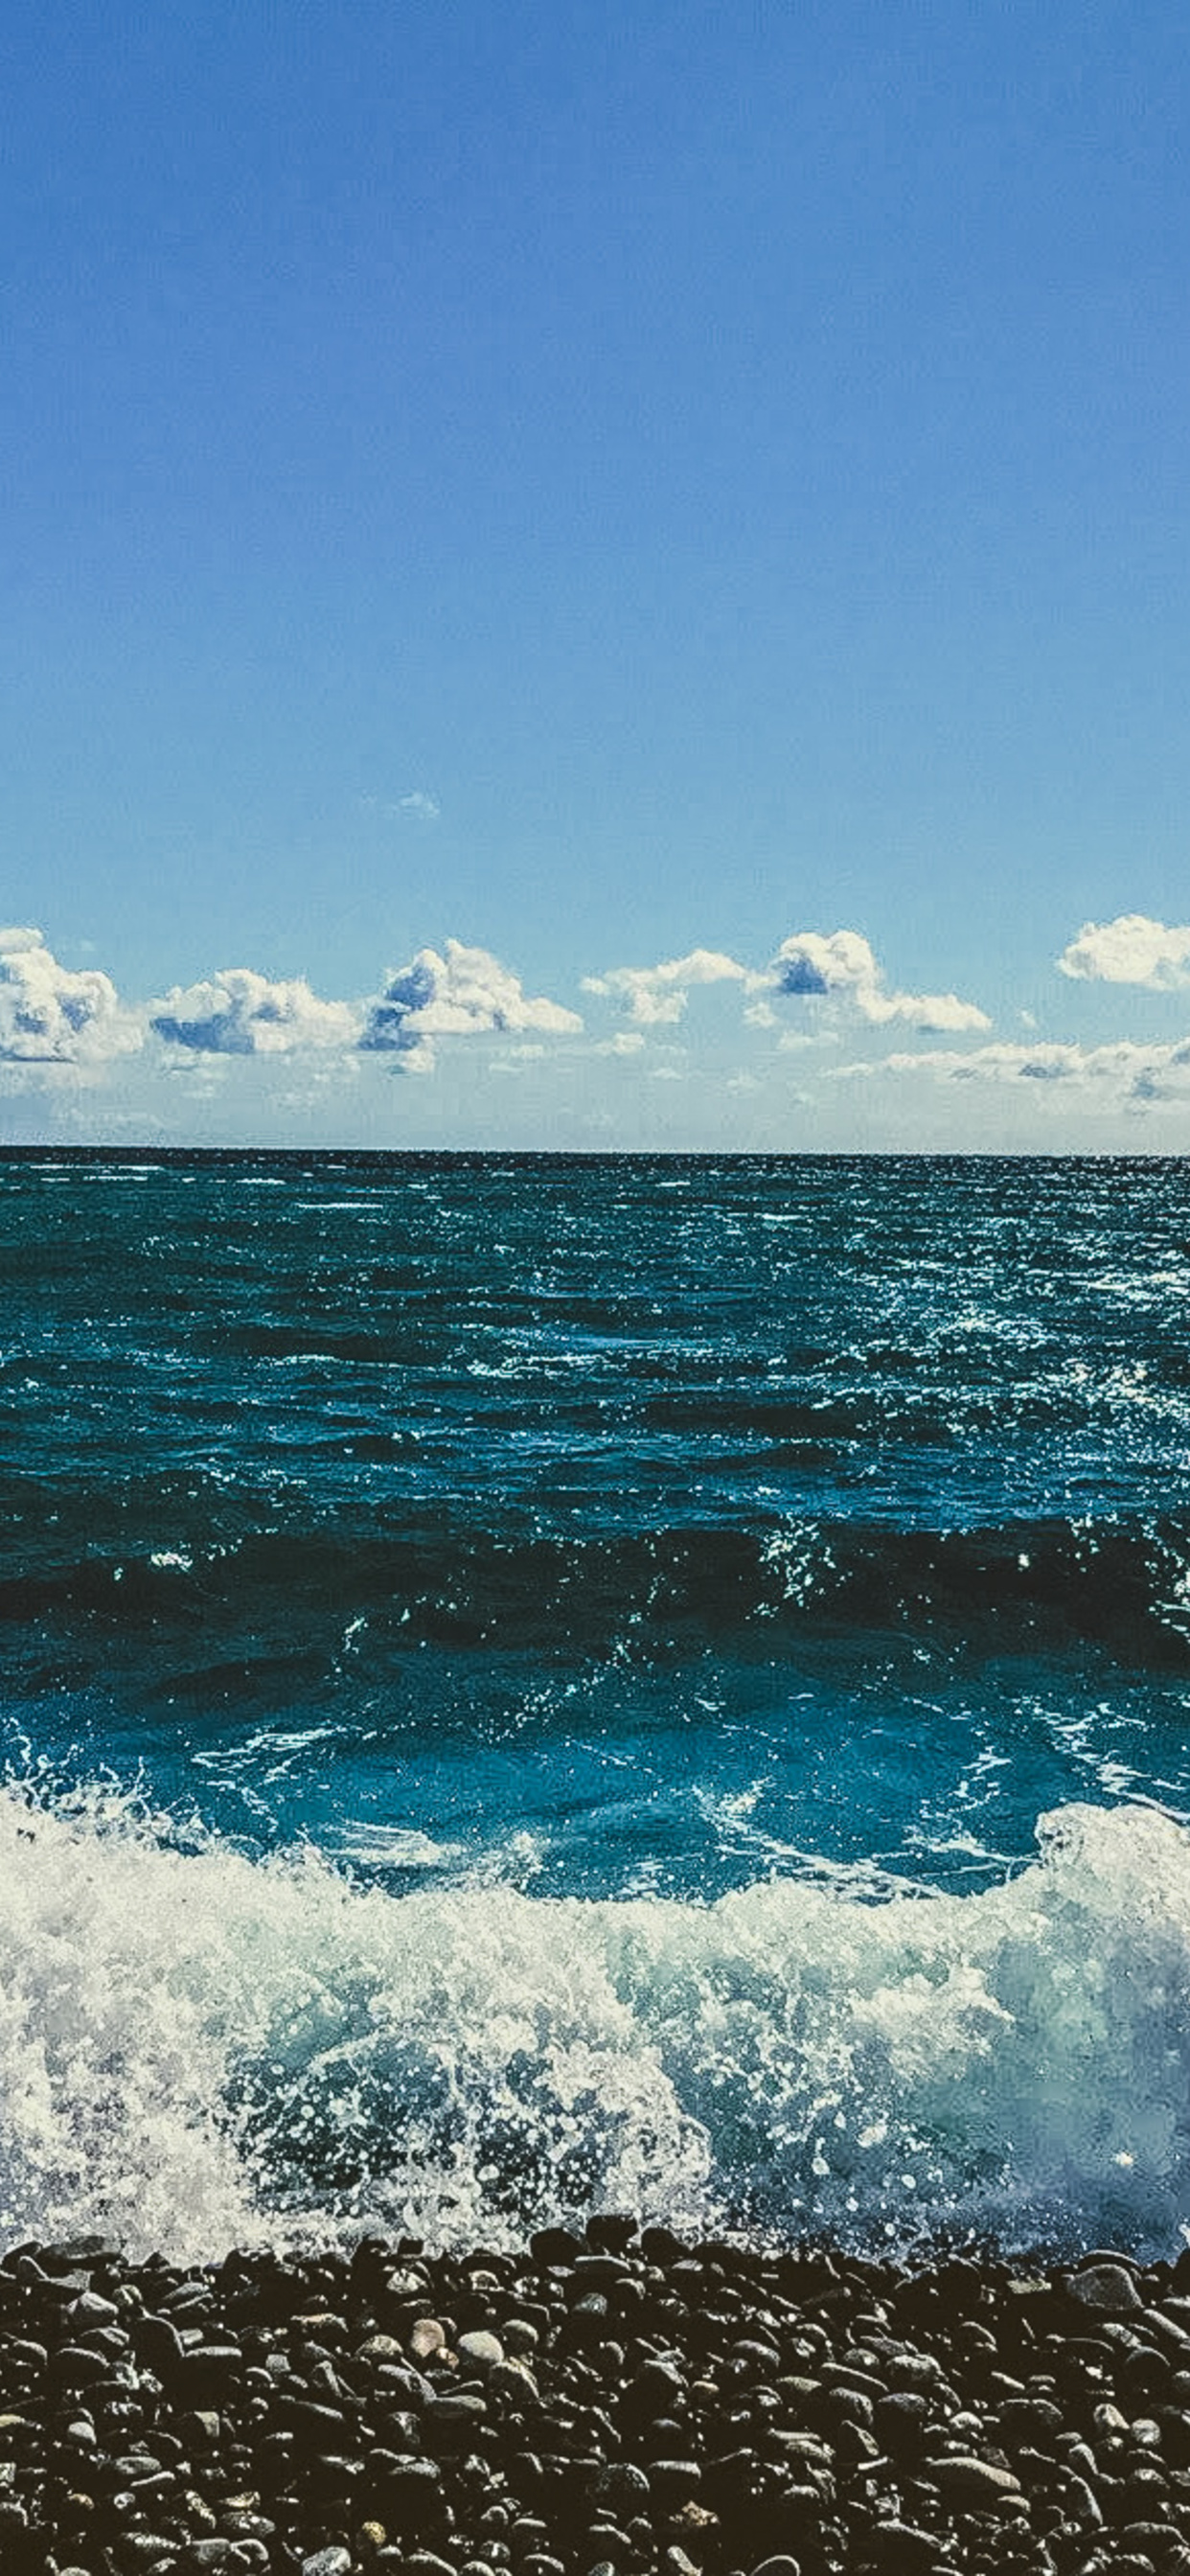 1242x2688 Cyan Sea Ocean Hd Iphone Xs Max Hd 4k Wallpapers